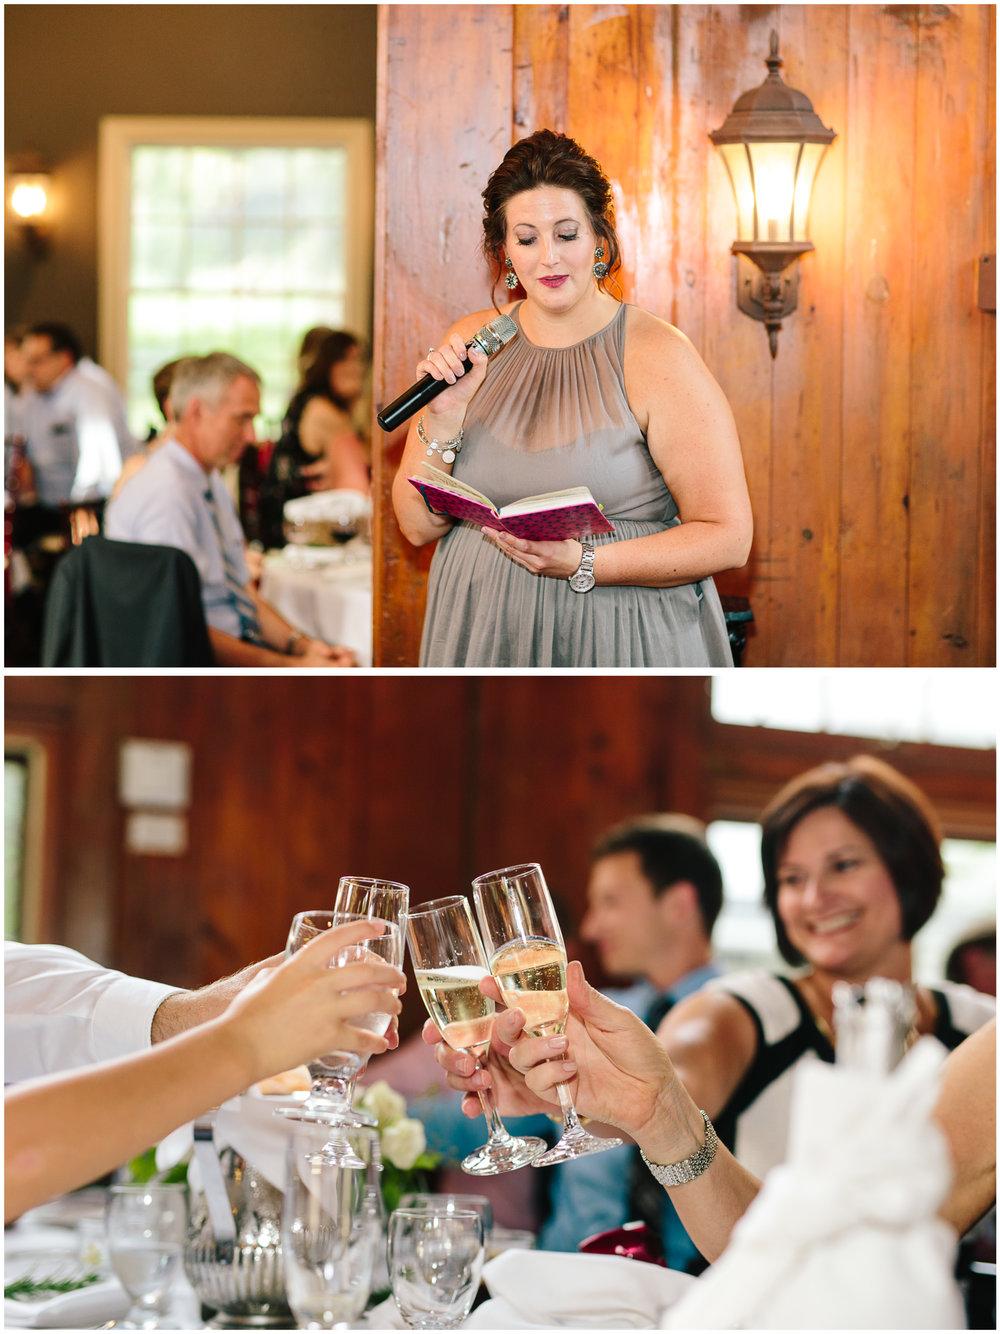 ann_arbor_michigan_wedding_86.jpg